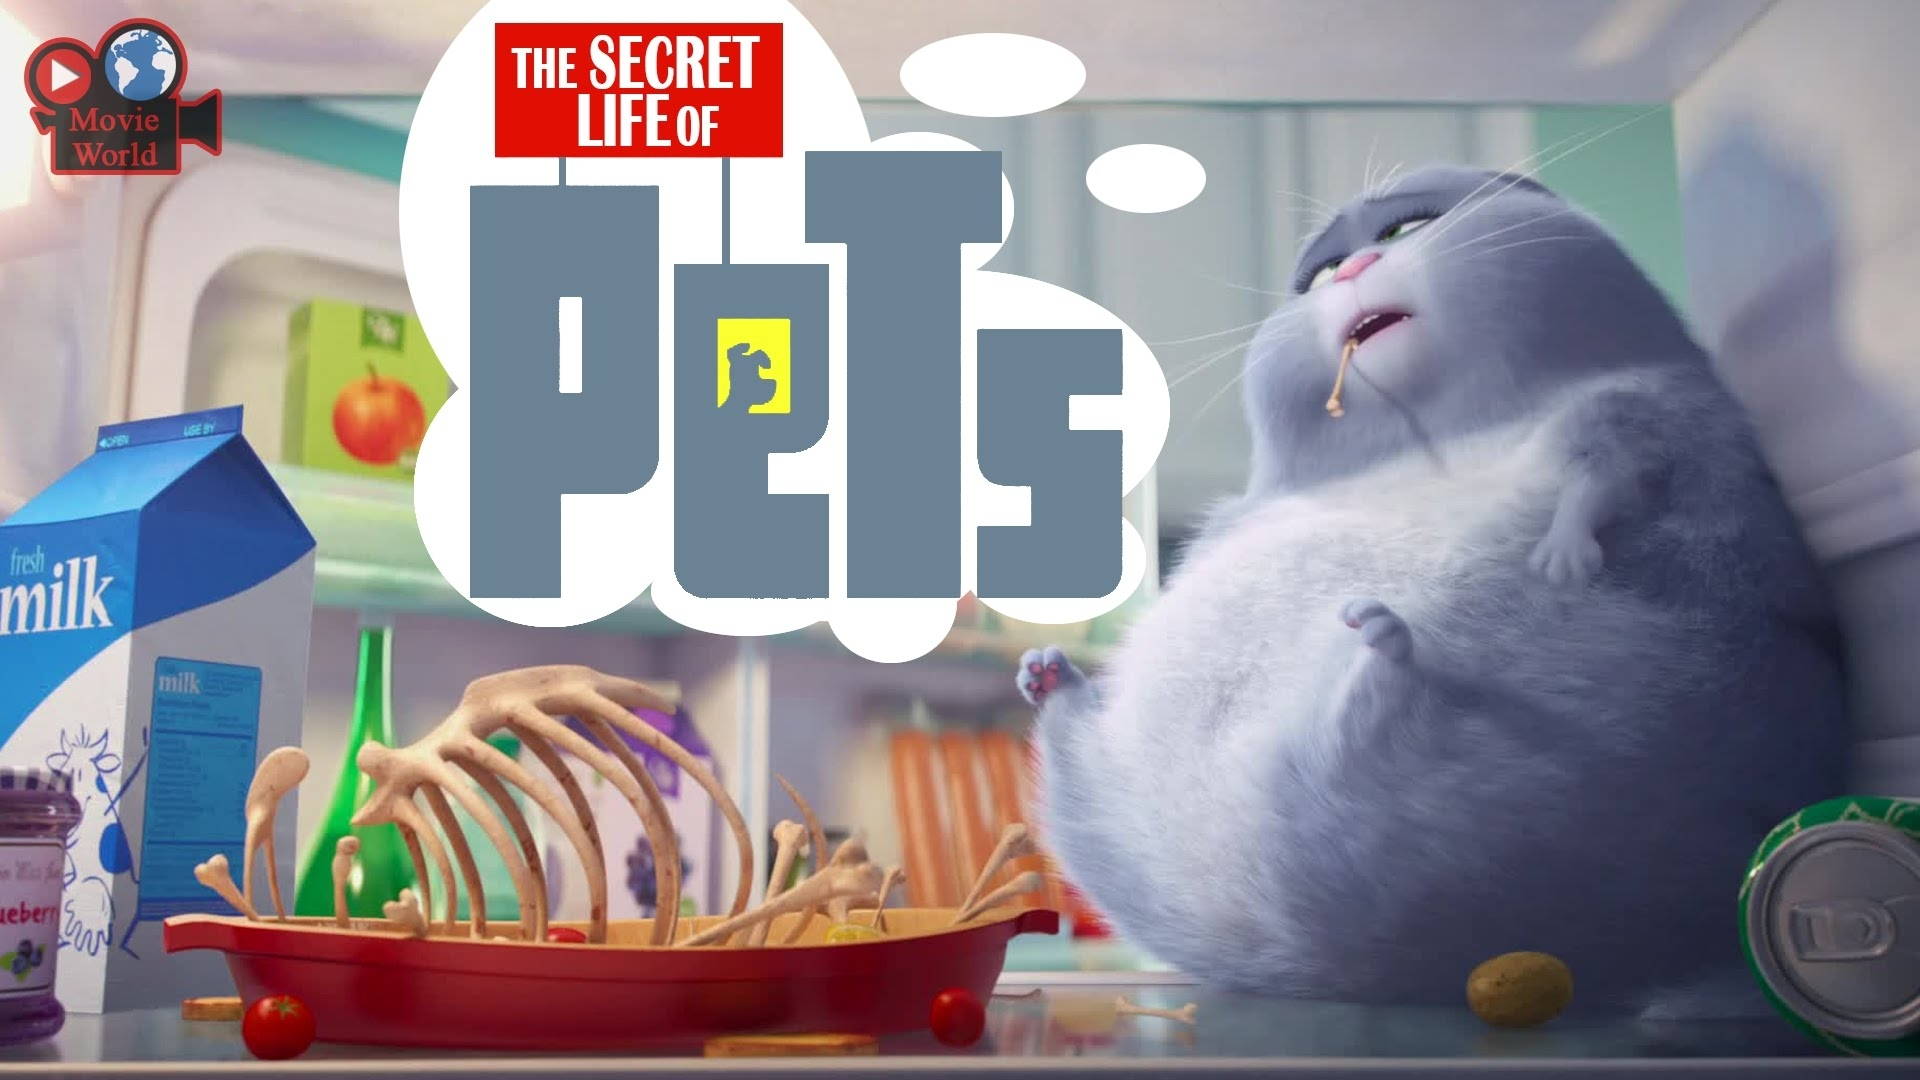 the secret life of pets images the secret life of pets hd wallpaper